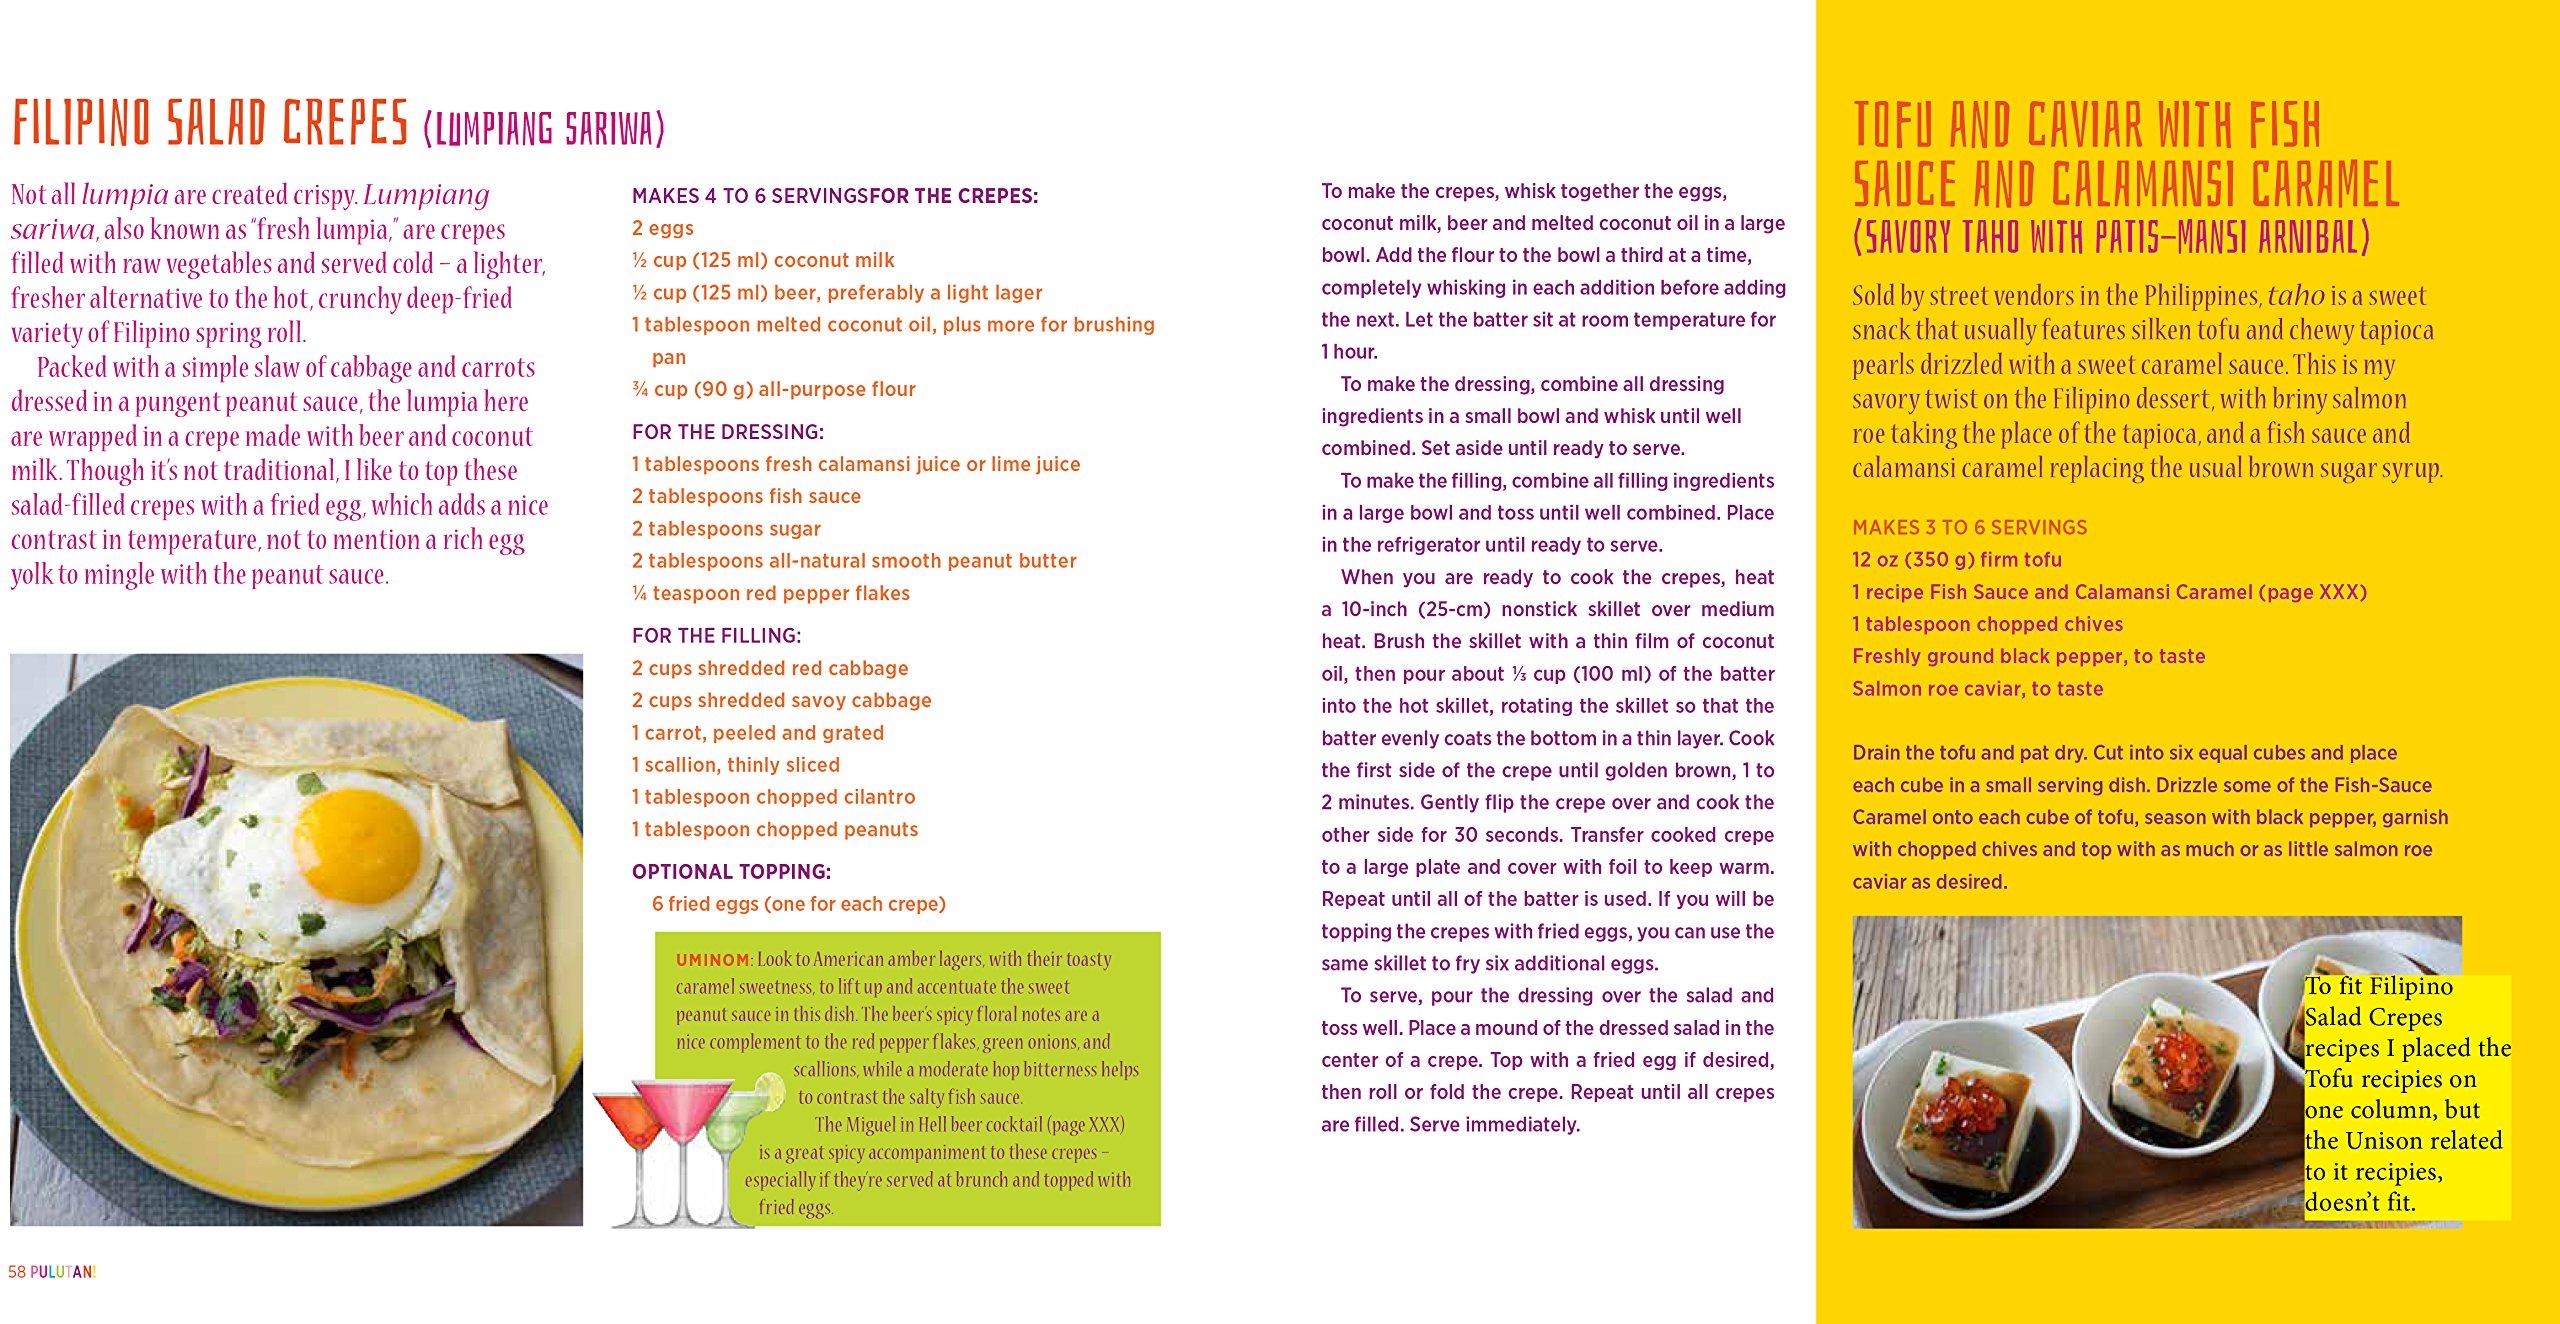 Pulutan filipino party recipes street foods and small plates from filipino party recipes street foods and small plates from the philippines 55 easy to make pinoy favorites marvin gapultos 9780804849425 amazon forumfinder Images